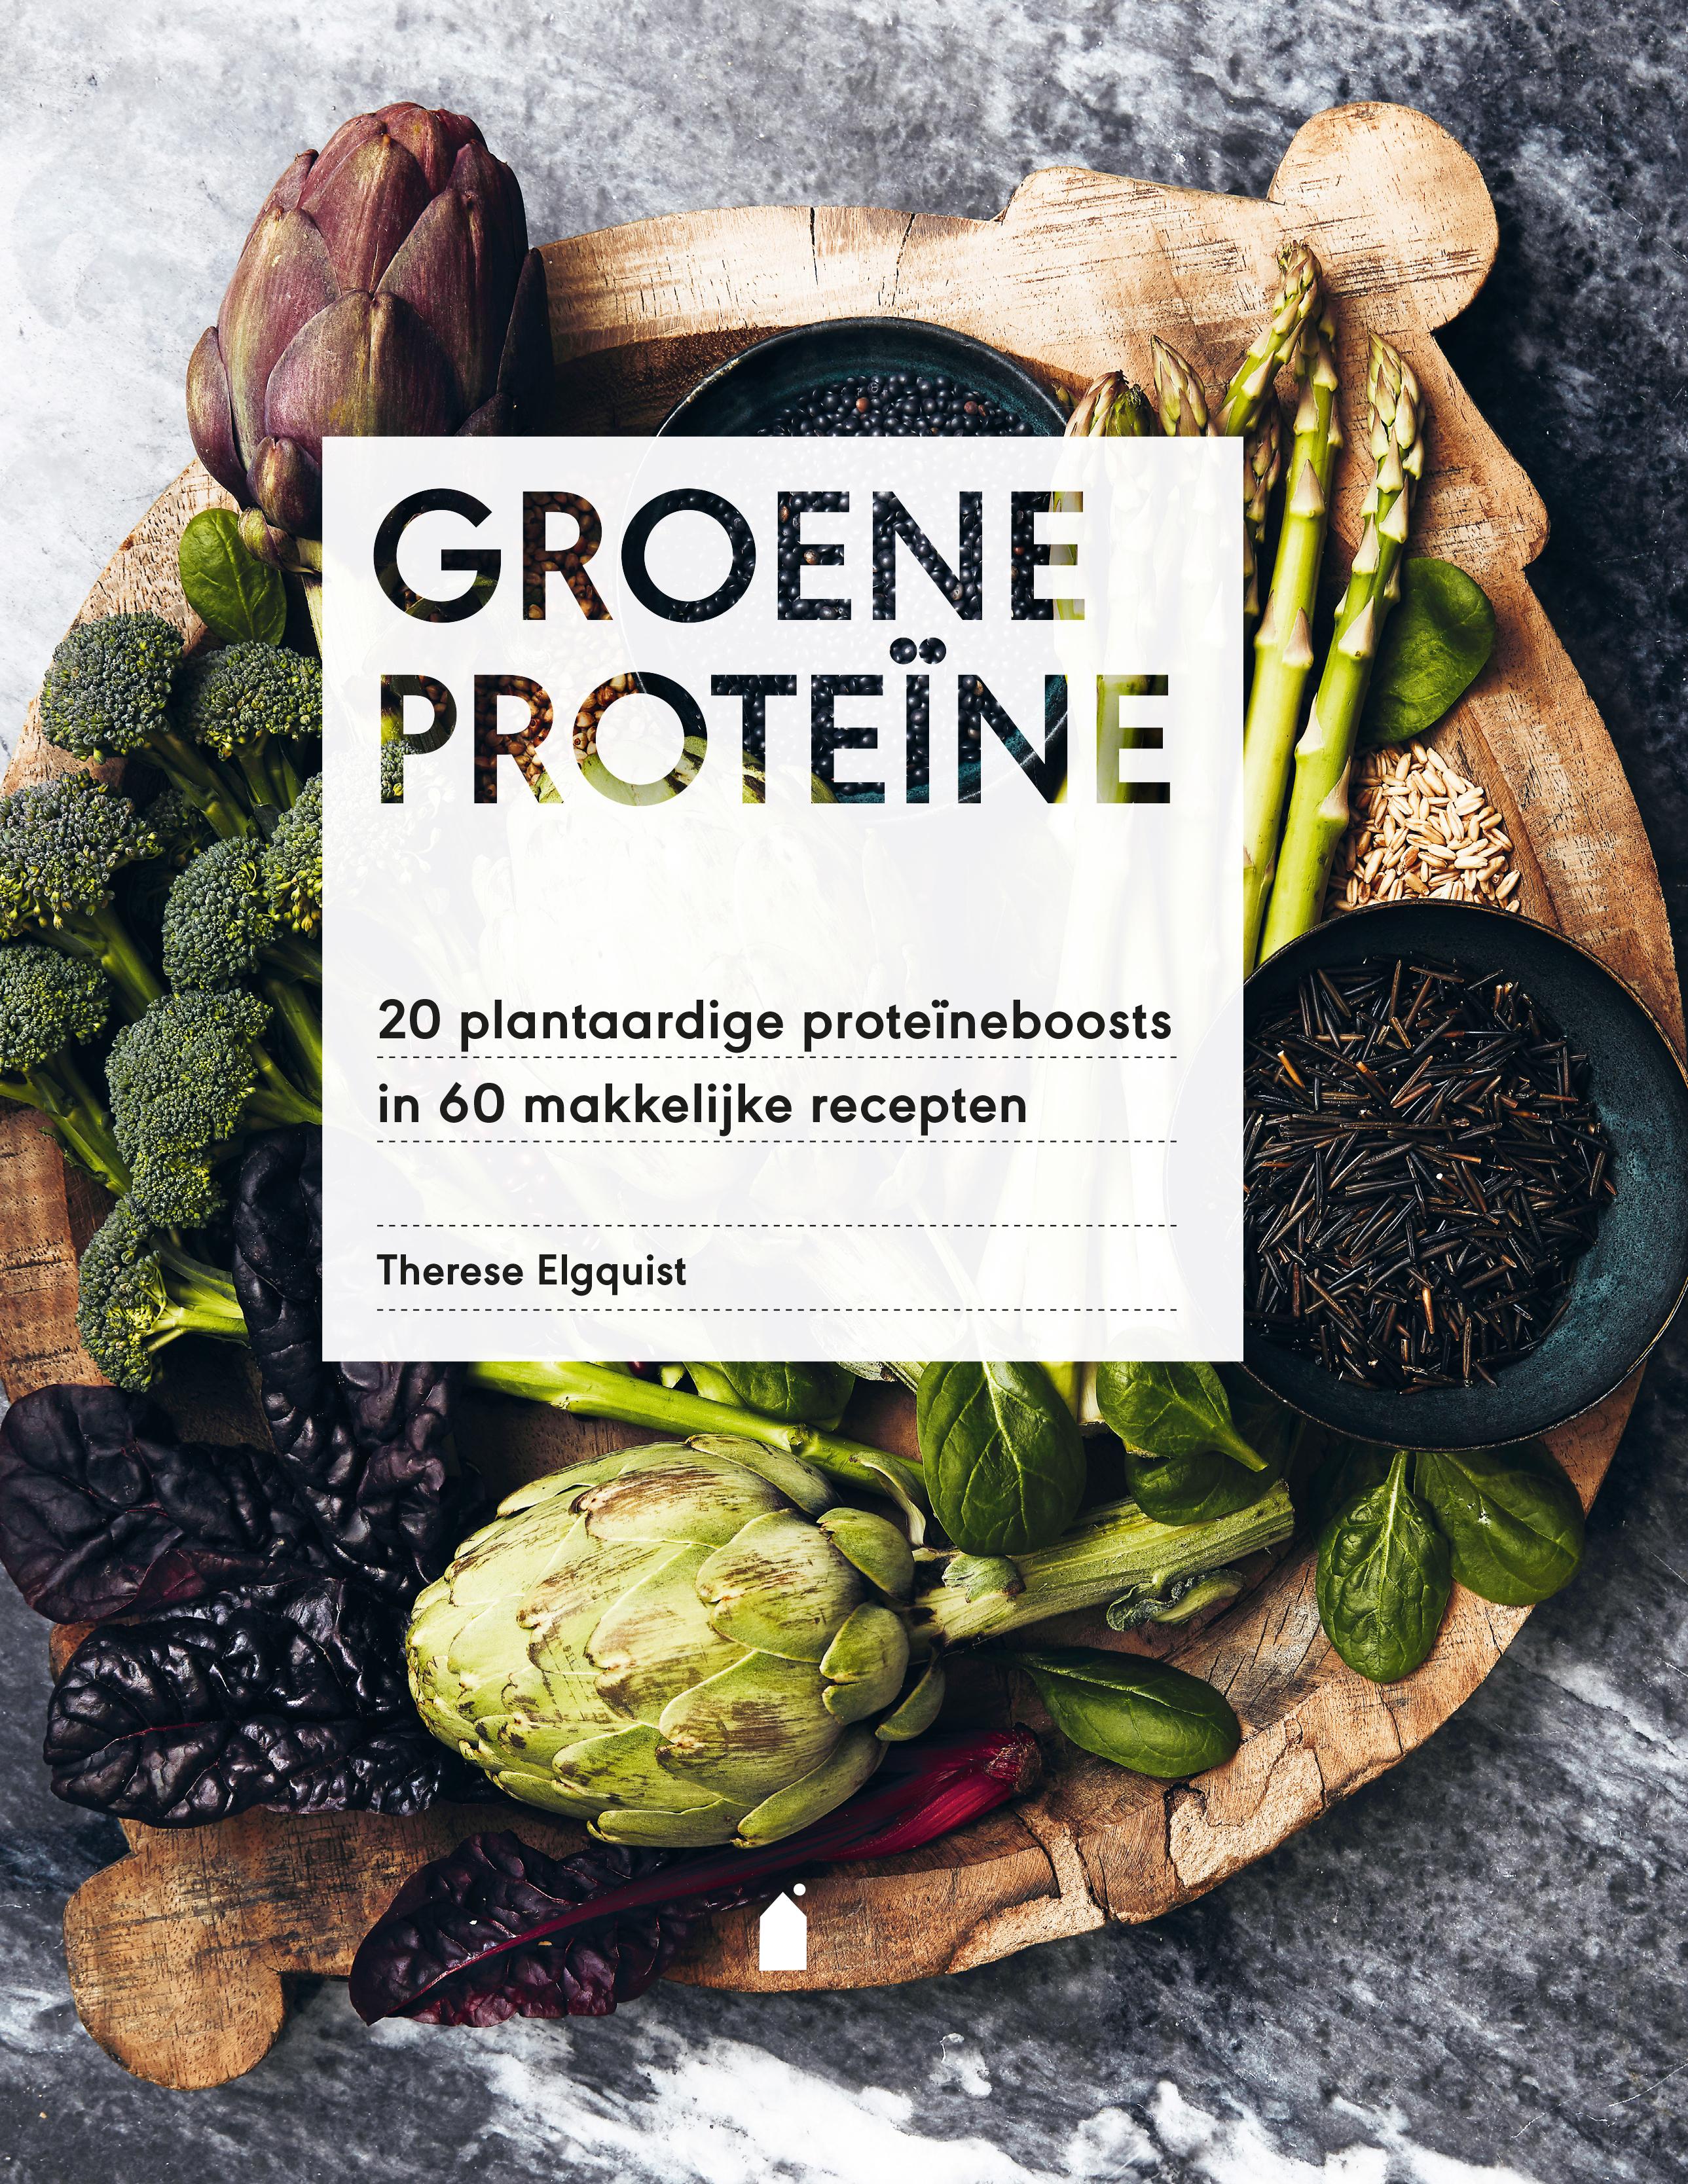 Groene proteine